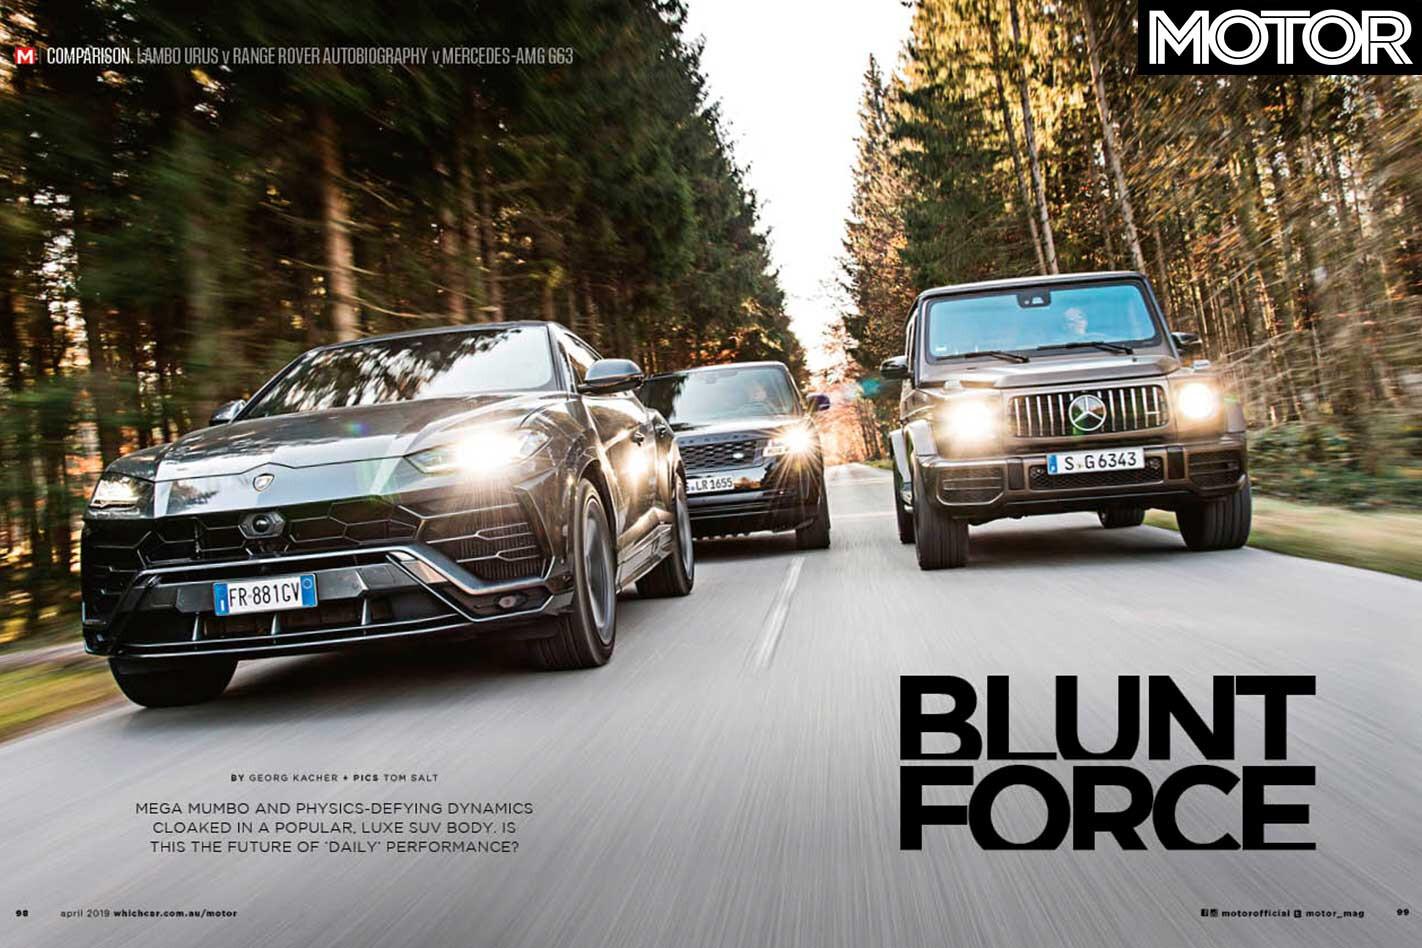 MOTOR Magazine April 2019 Issue Lamborghini Urus Vs Range Rover Autobiography Vs Mercedes AMG G 63 Feature Jpg